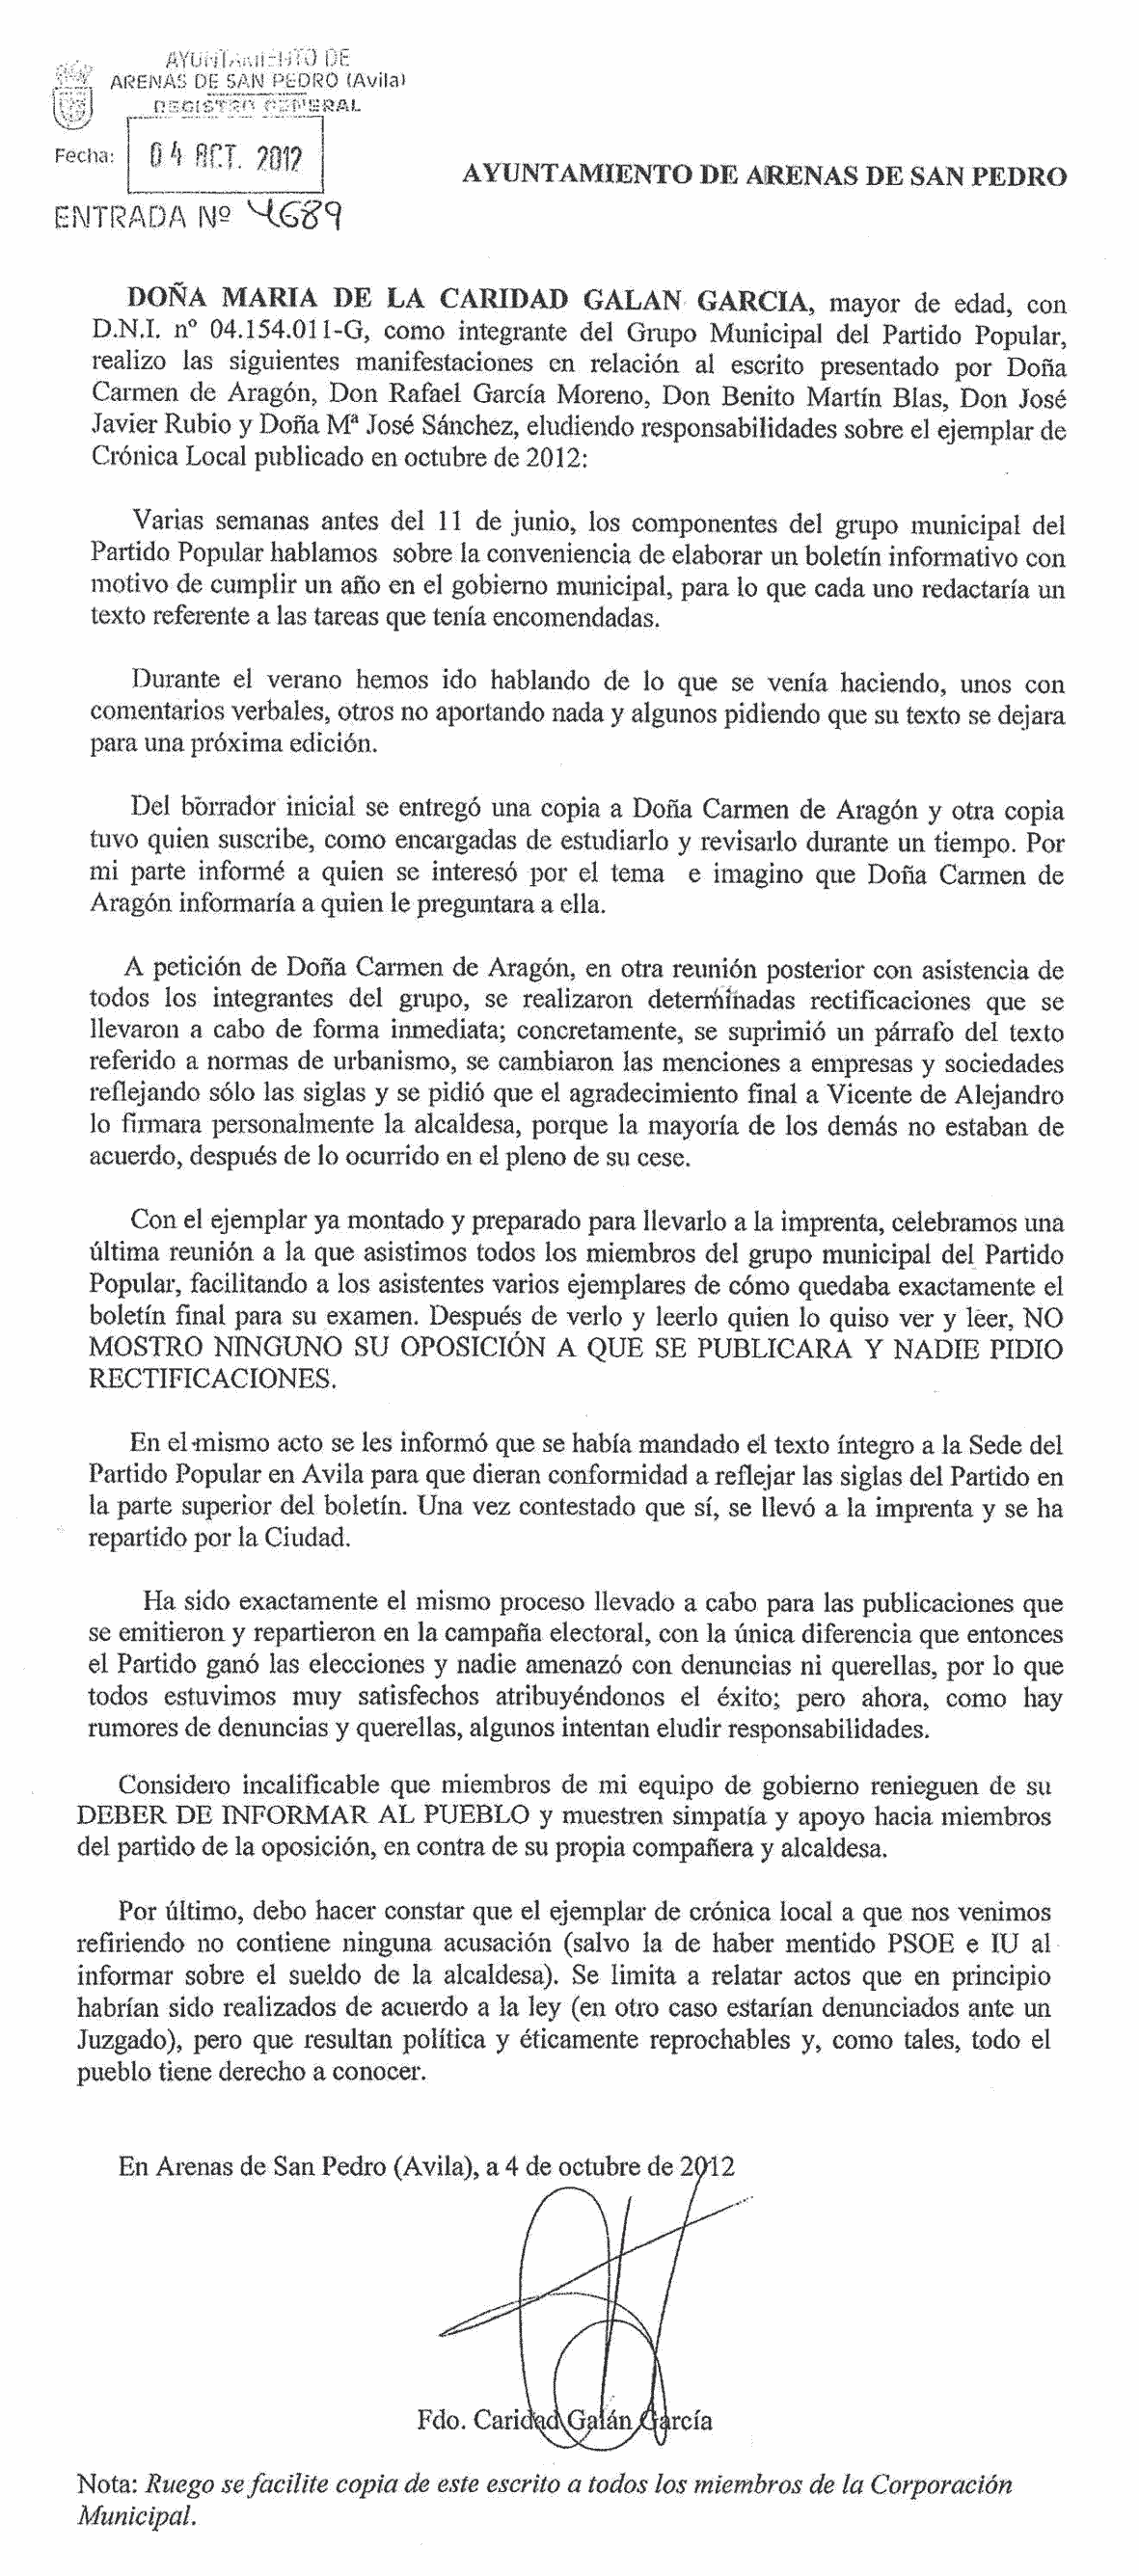 2012-10-04 Carta Caridad Galán - Alcaldesa de Arenas de San Pedro